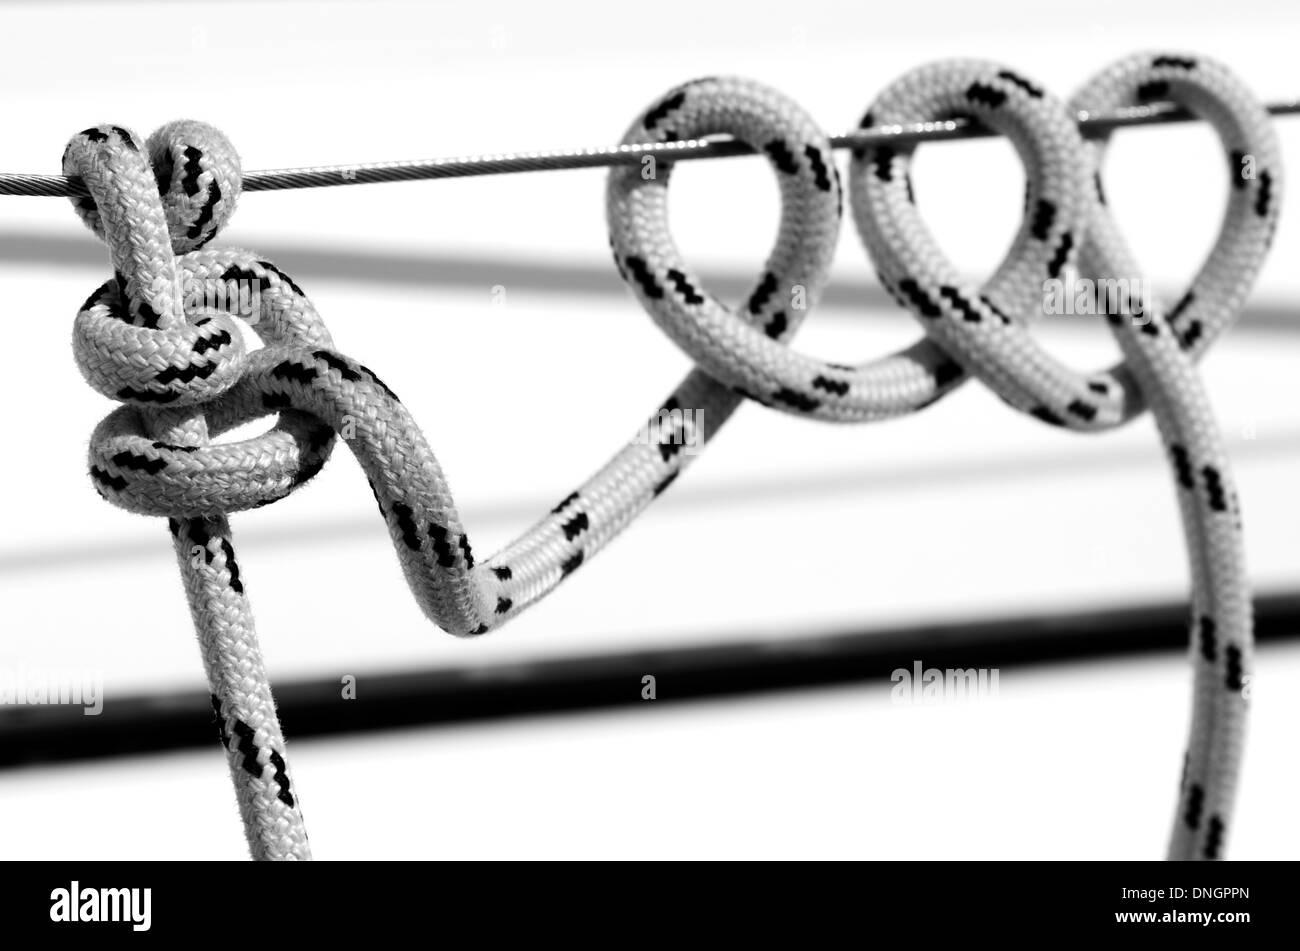 Marine knot detail on stainless steel boat railing banister - Stock Image